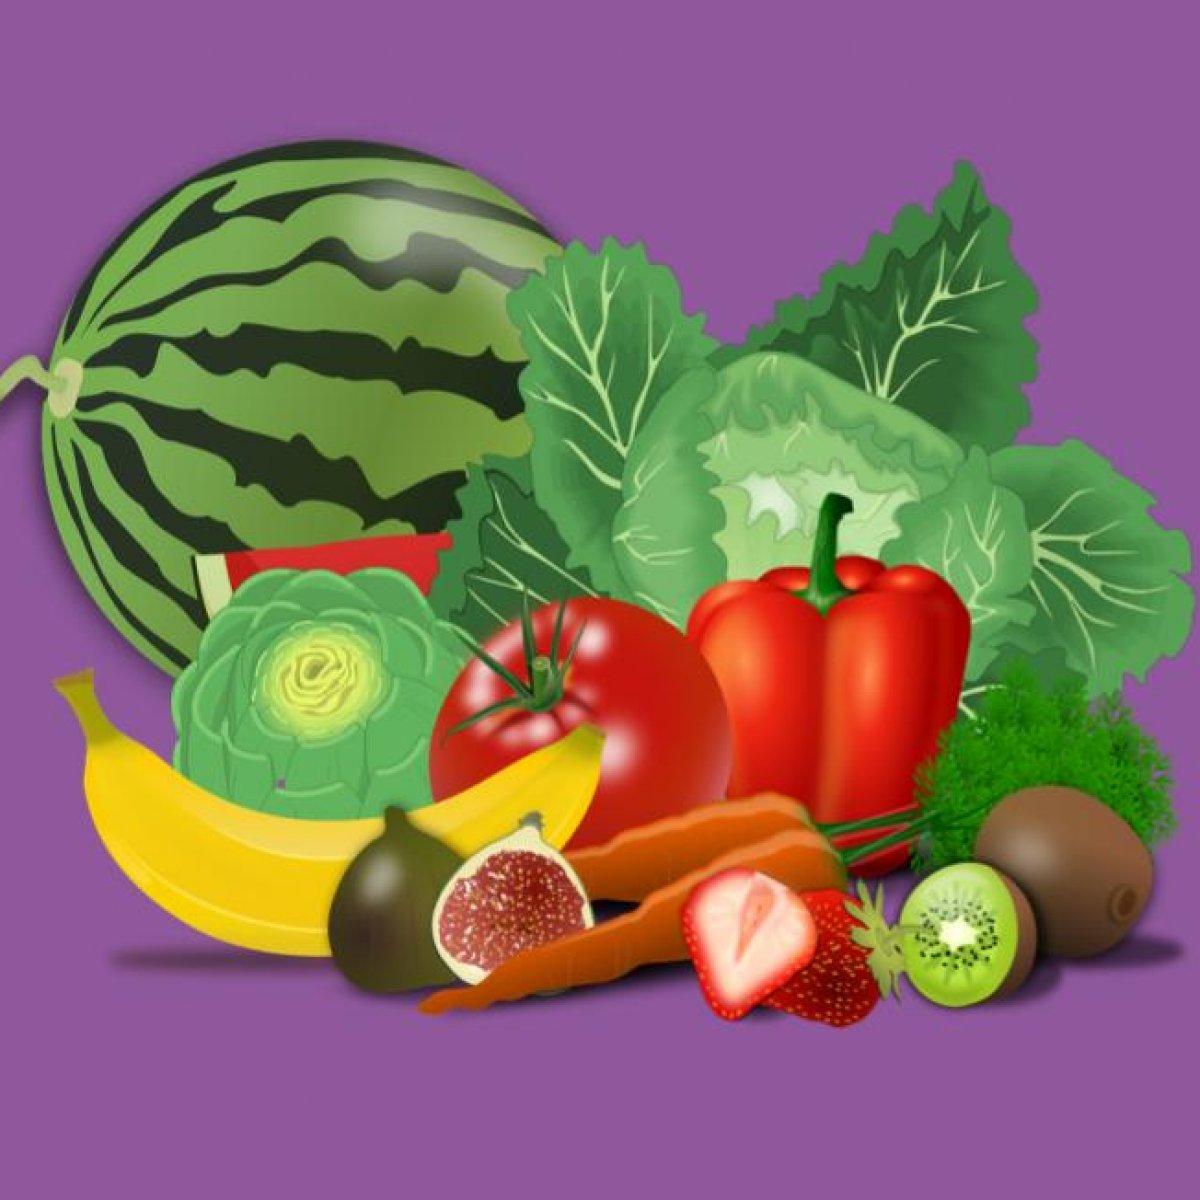 Site Circles (1047x652) (Food Distribution)